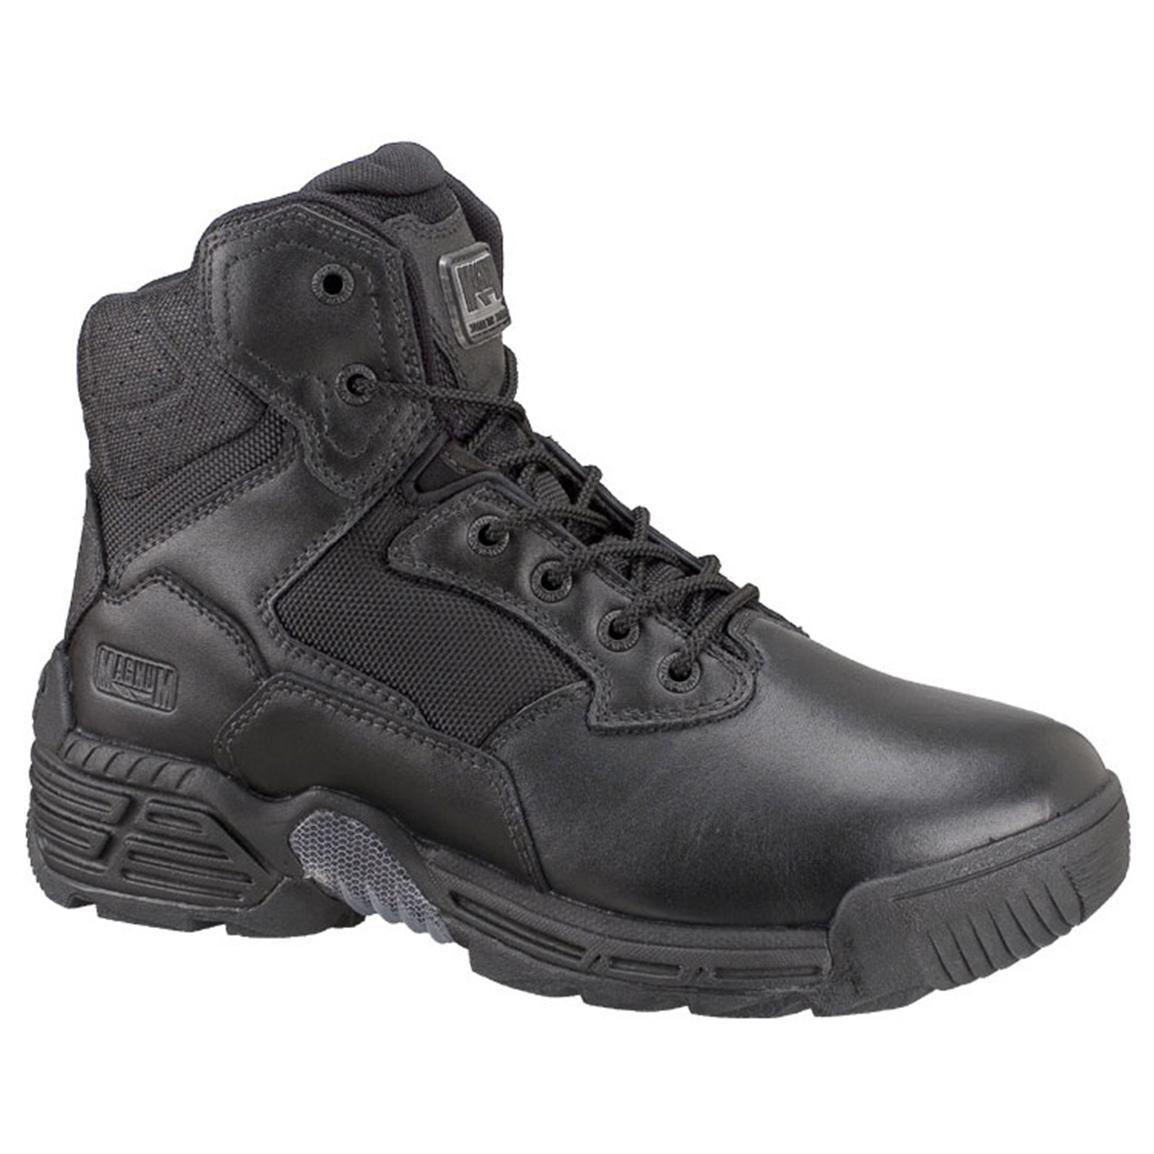 "Men's Magnum® 6"" Stealth Force Combat Boots"